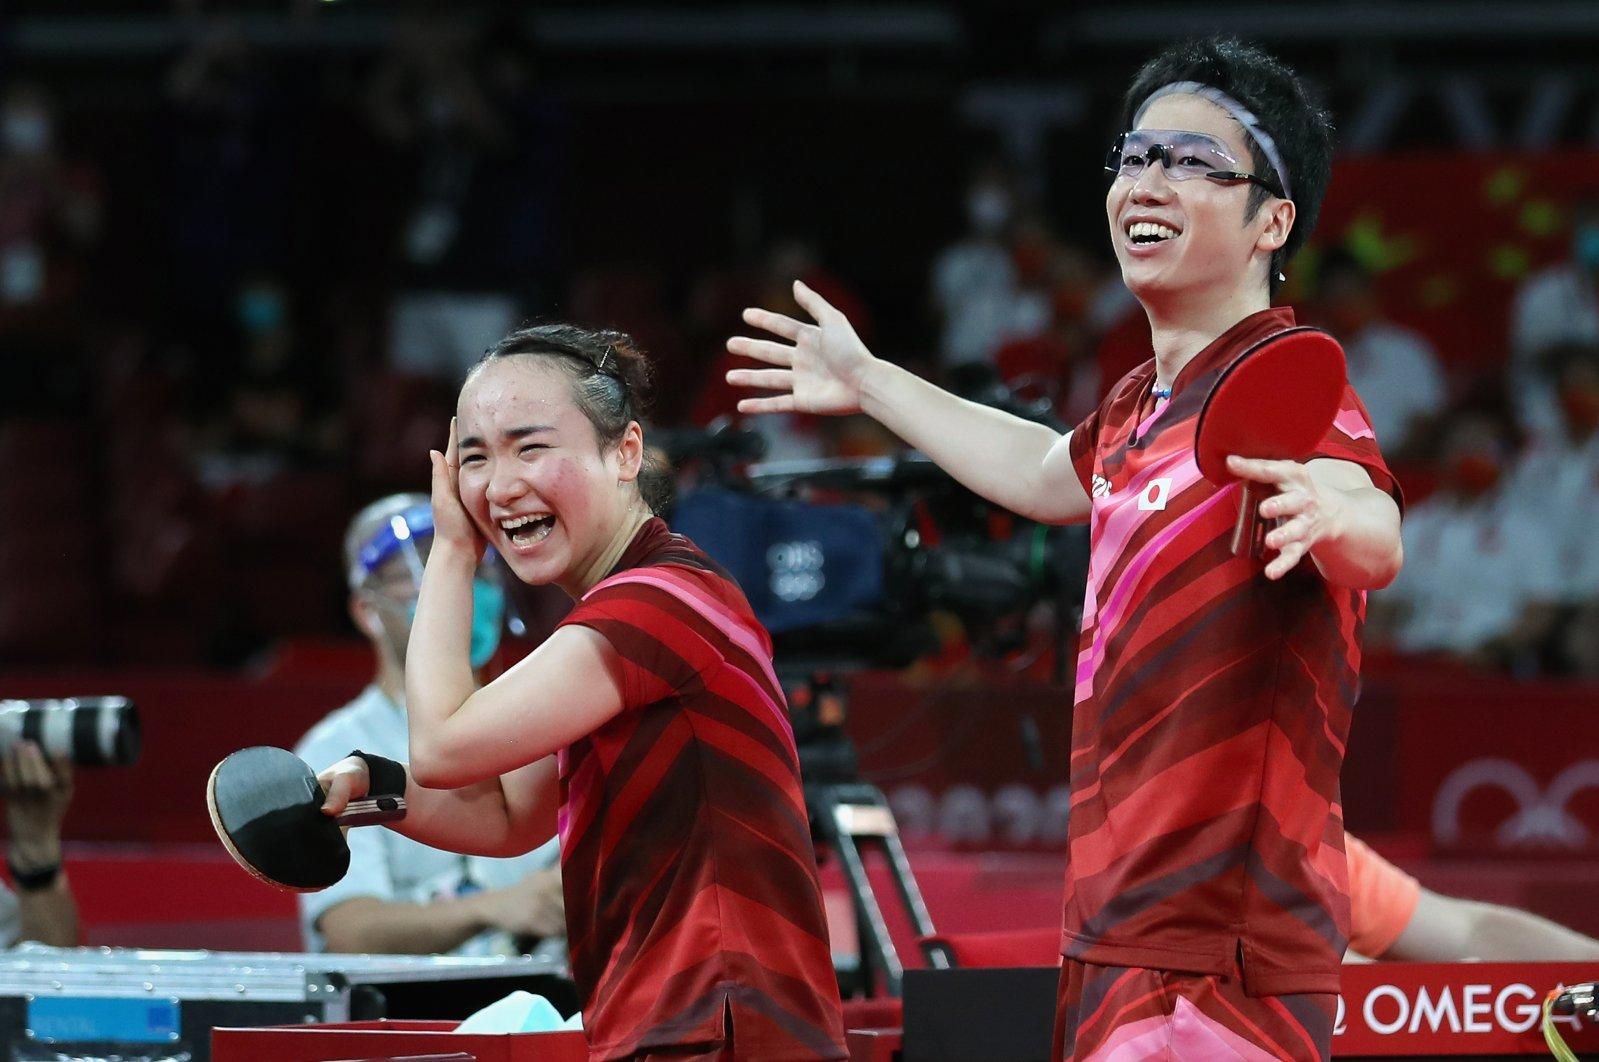 Japan's Jun Mizutani (R) and Mima Ito (L) reacts after winning Table Tennis Mixed Doubles gold medals at the Tokyo 2020 Olympic Games, Tokyo, Japan, July 26, 2021. (EPA Photo)